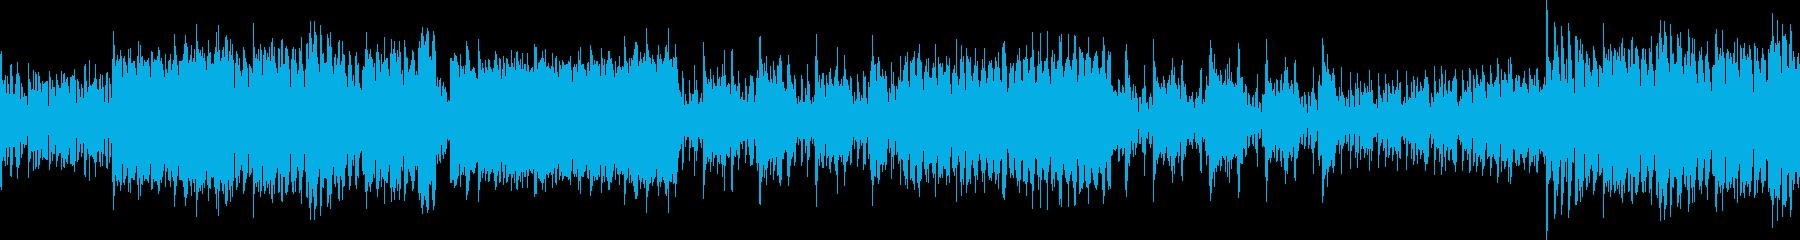 EDM風、クラブミュージックの再生済みの波形